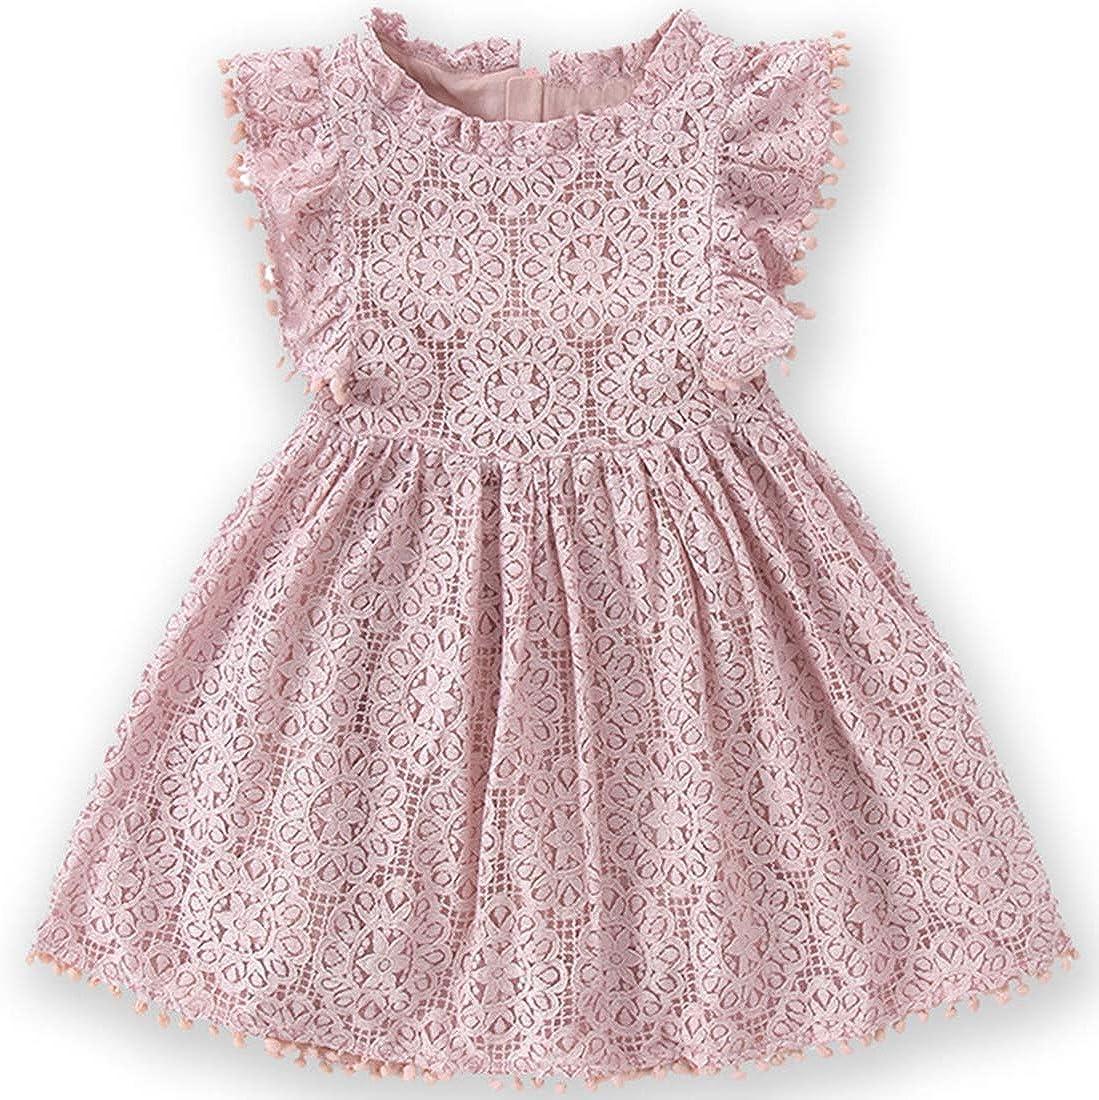 Niyage Toddler Girls Elegant Lace Pom Pom Flutter Sleeve Party Princess Dress